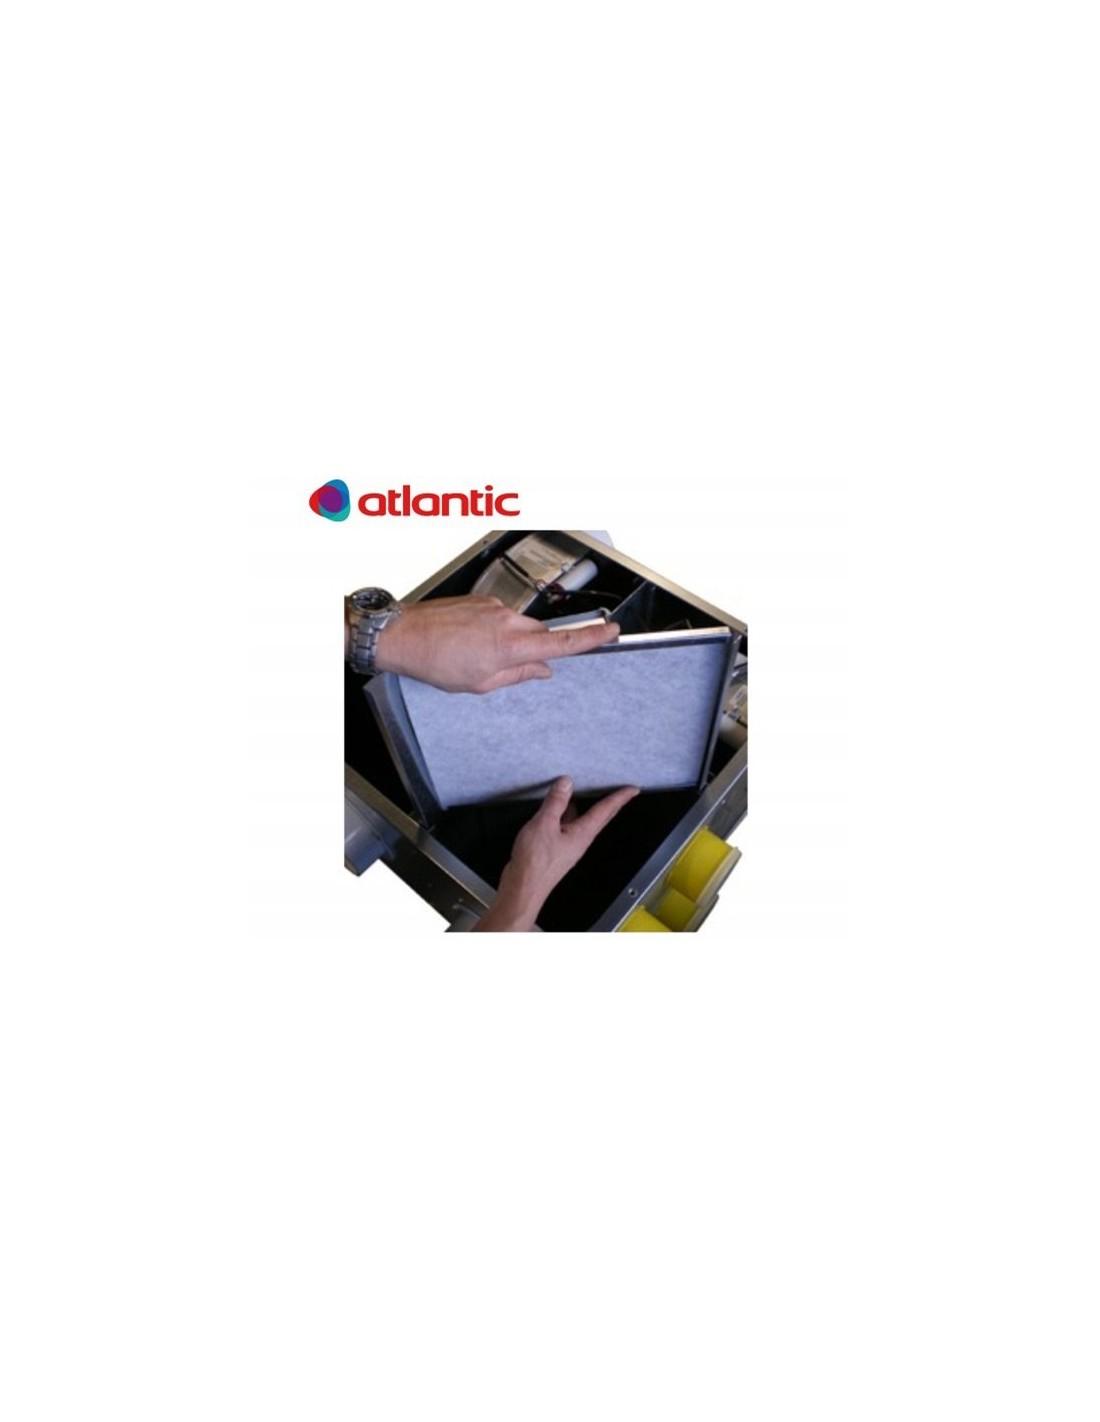 filtres pour vmc neodf double flux atlantic lot de 2 filtres. Black Bedroom Furniture Sets. Home Design Ideas